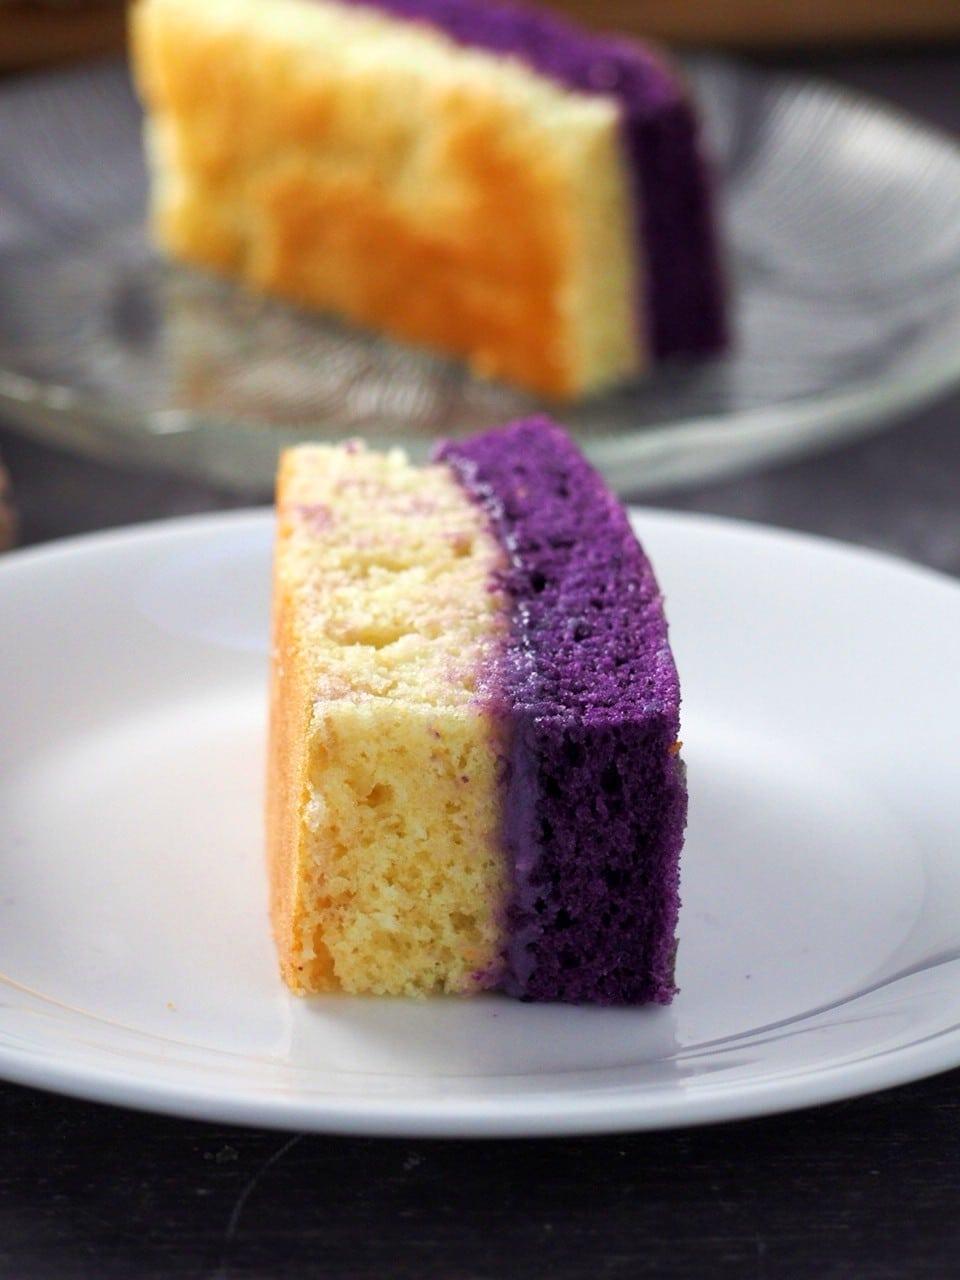 Close up of an ube and vanilla chiffon cake slice.